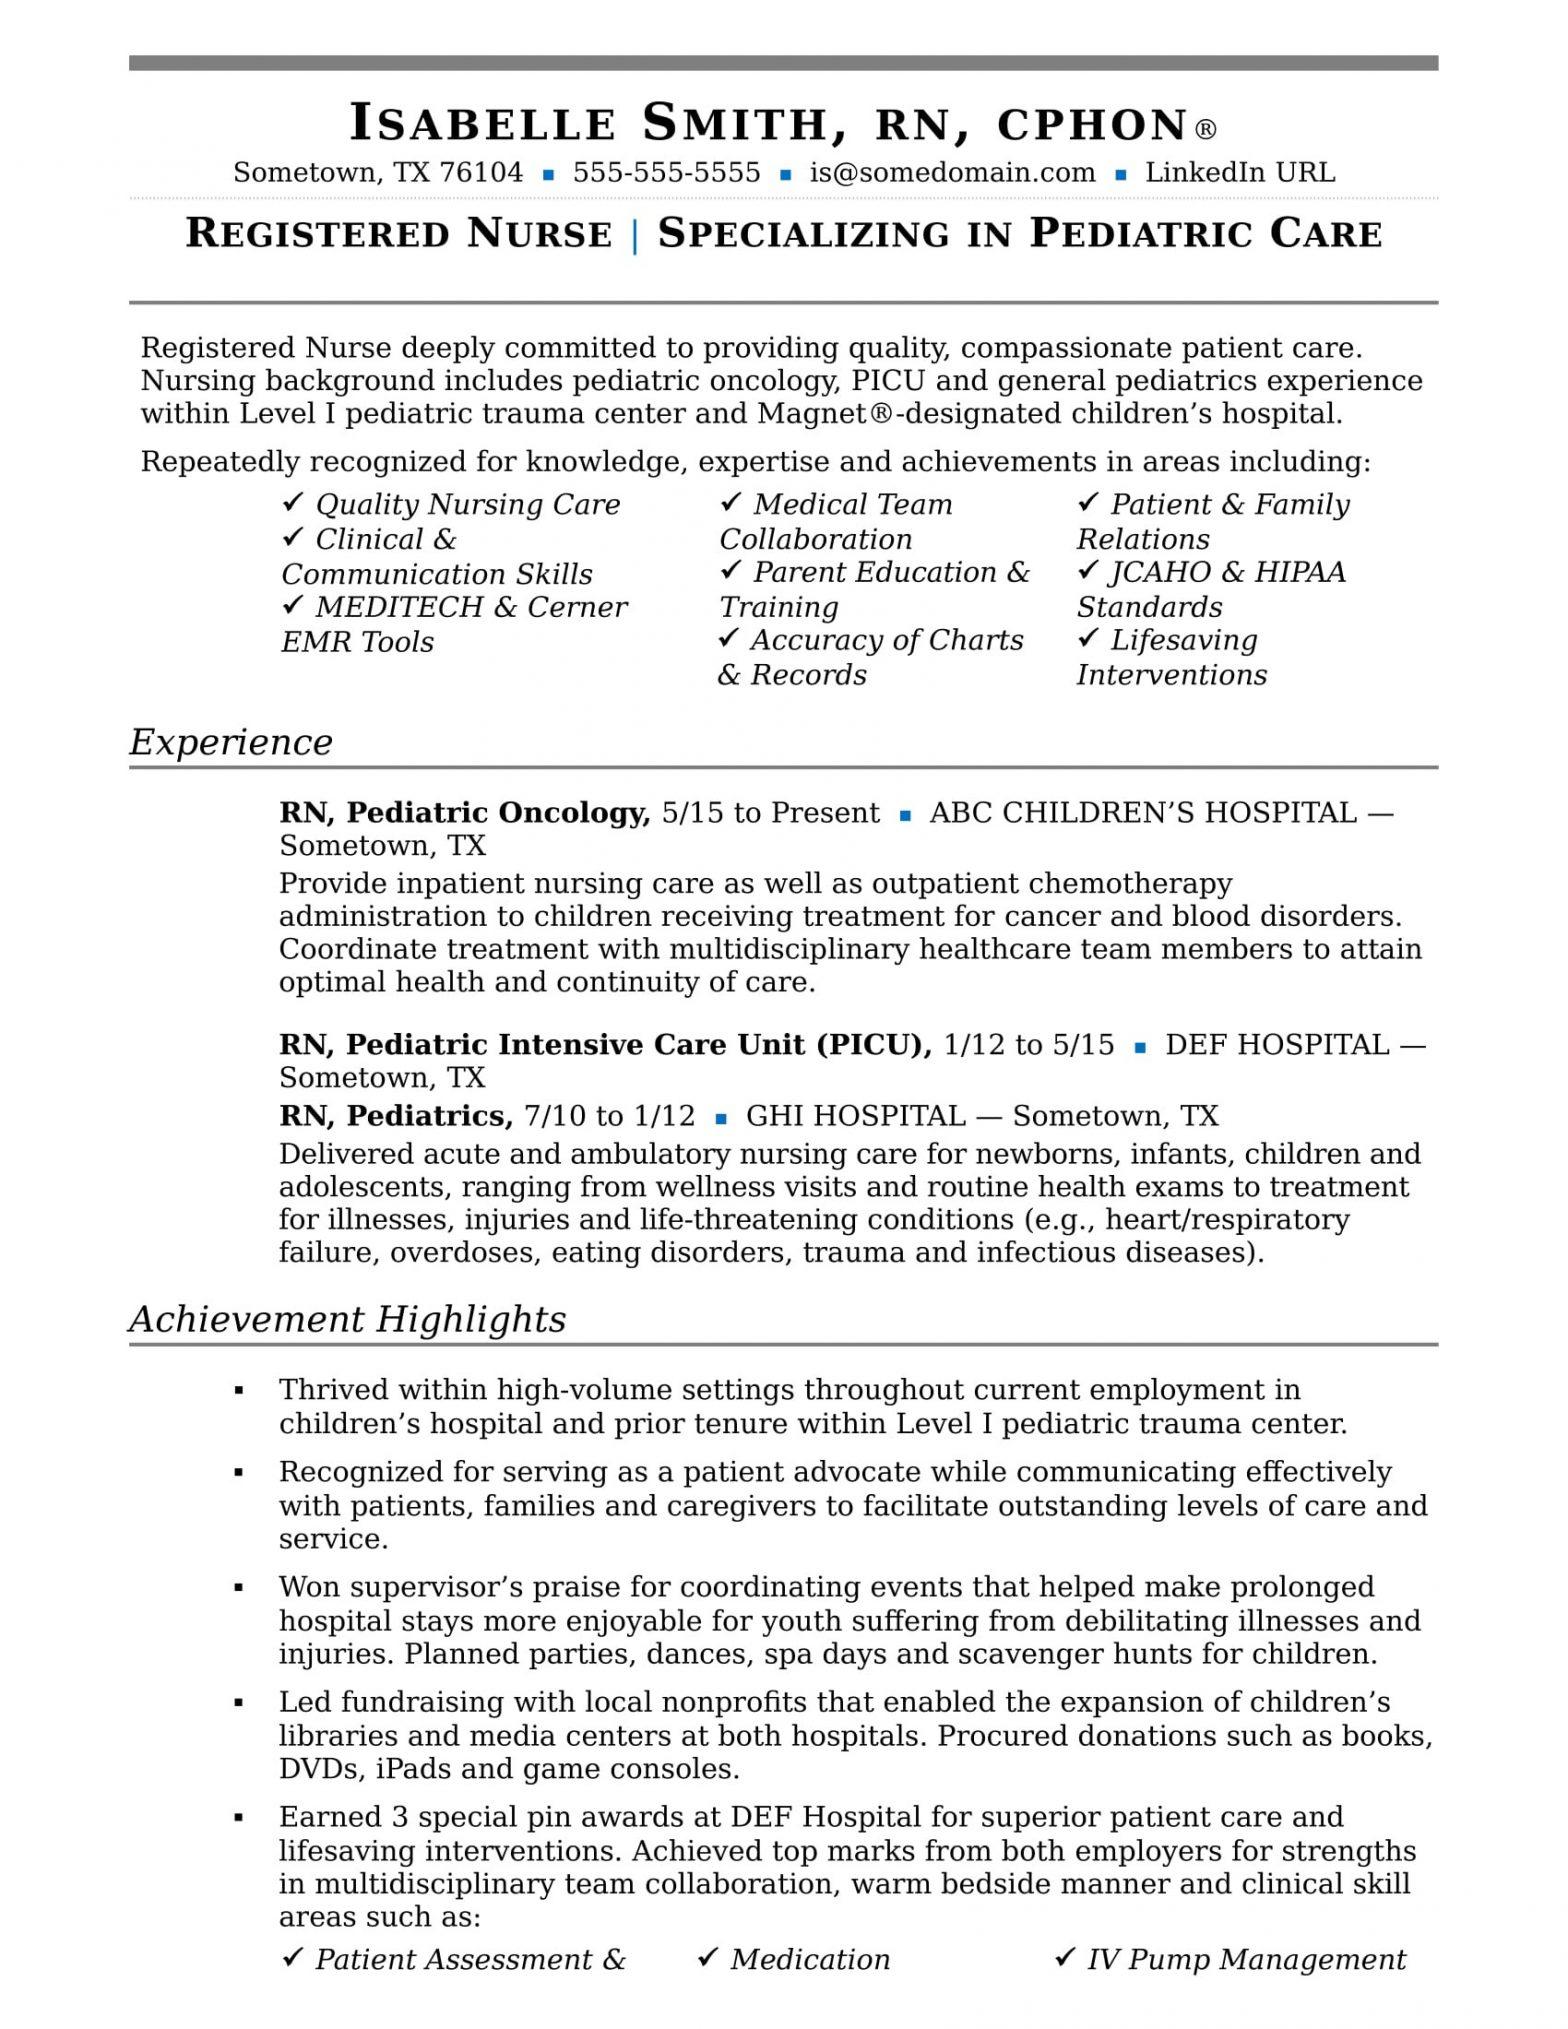 Sample Of A Good Resume for Nurses Nurse Resume Sample Monster.com